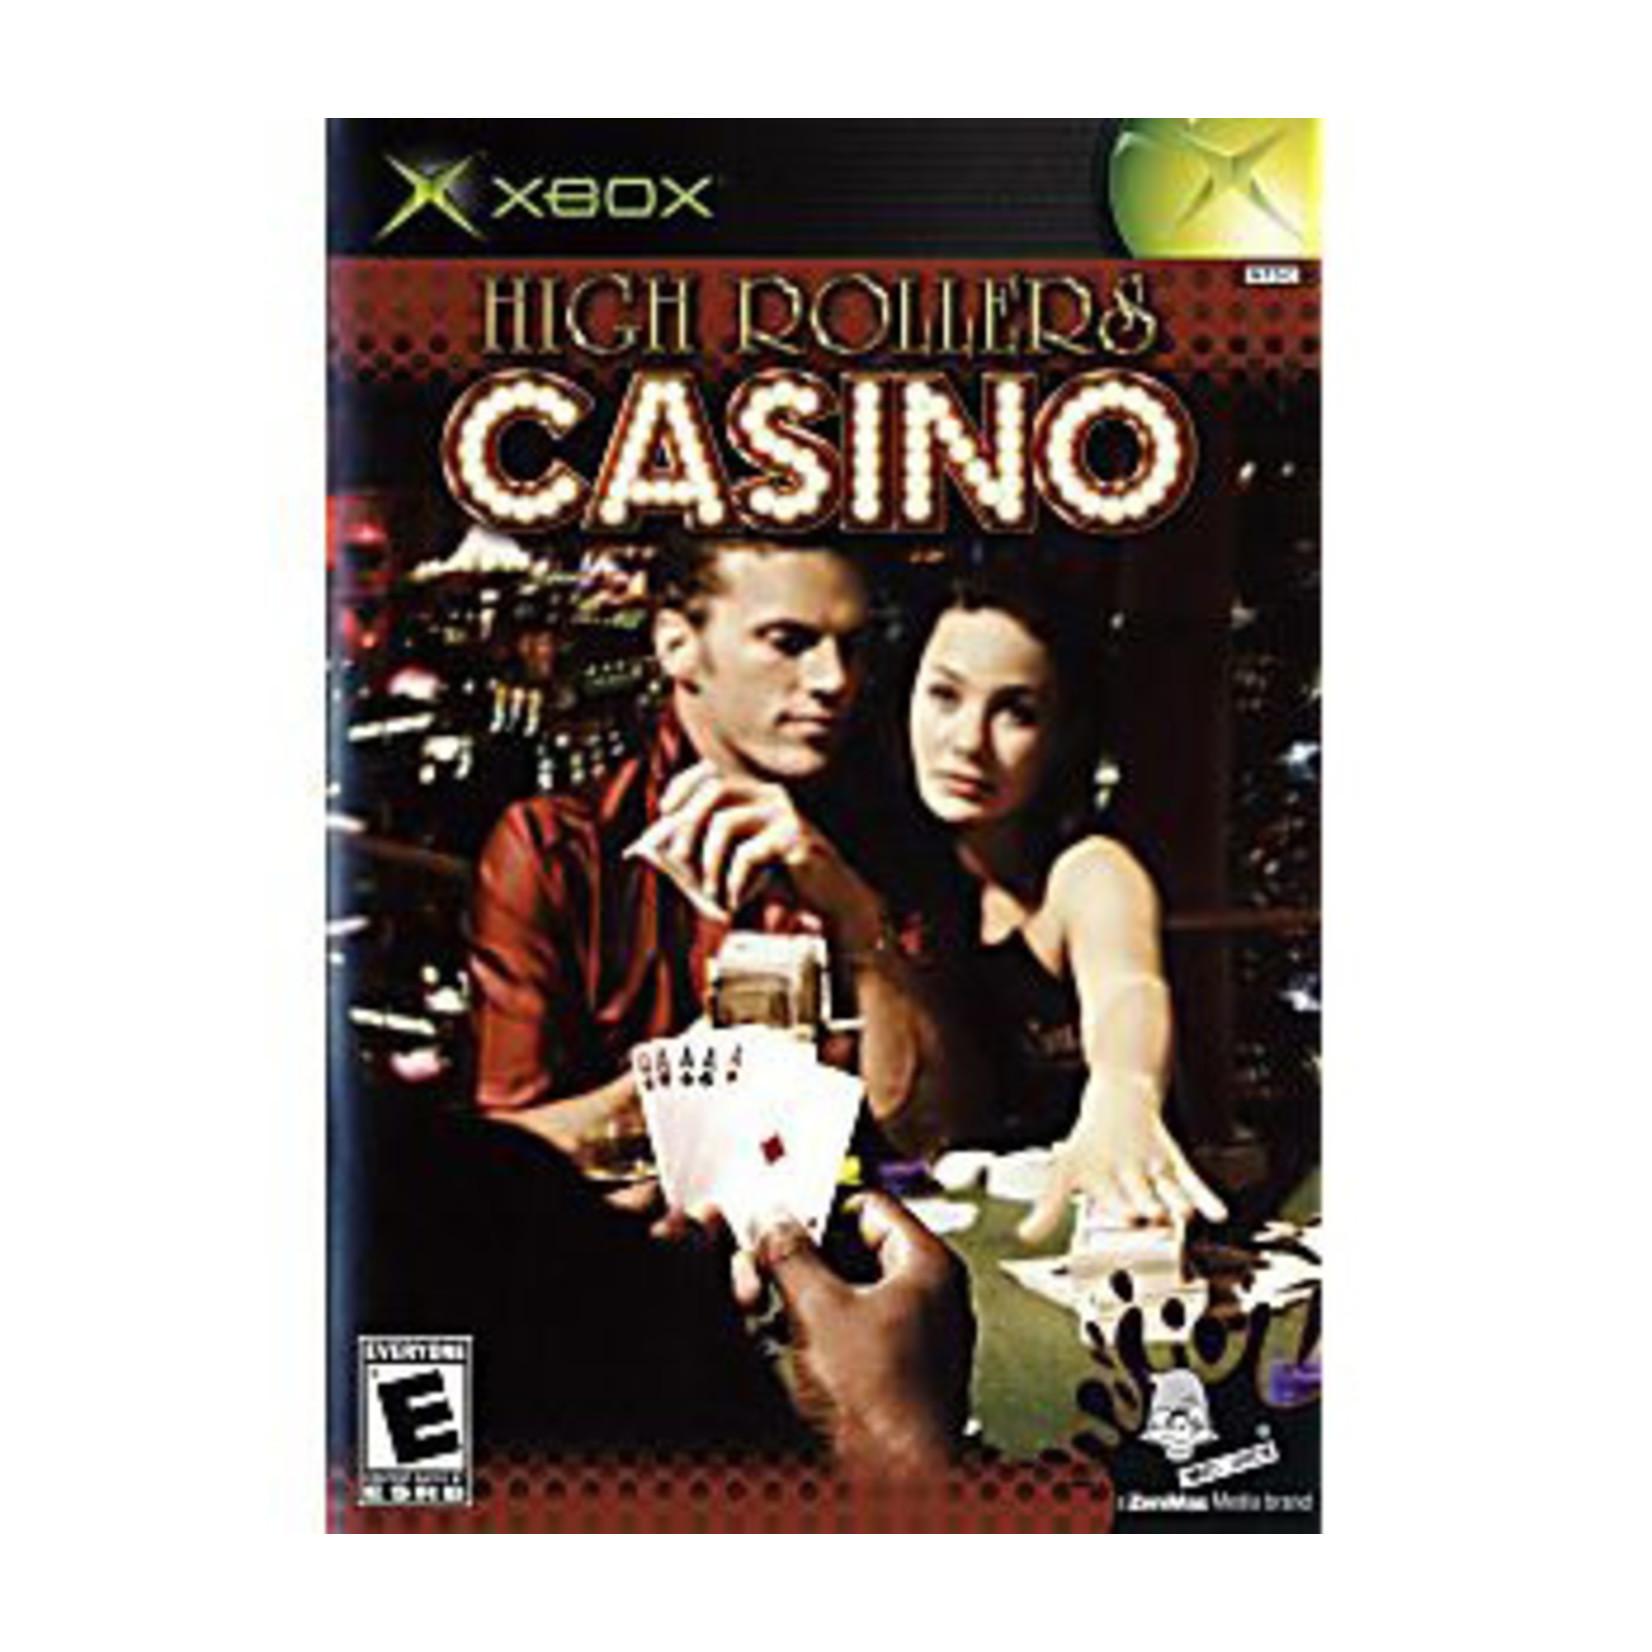 XBU-HIGH ROLLERS CASINO